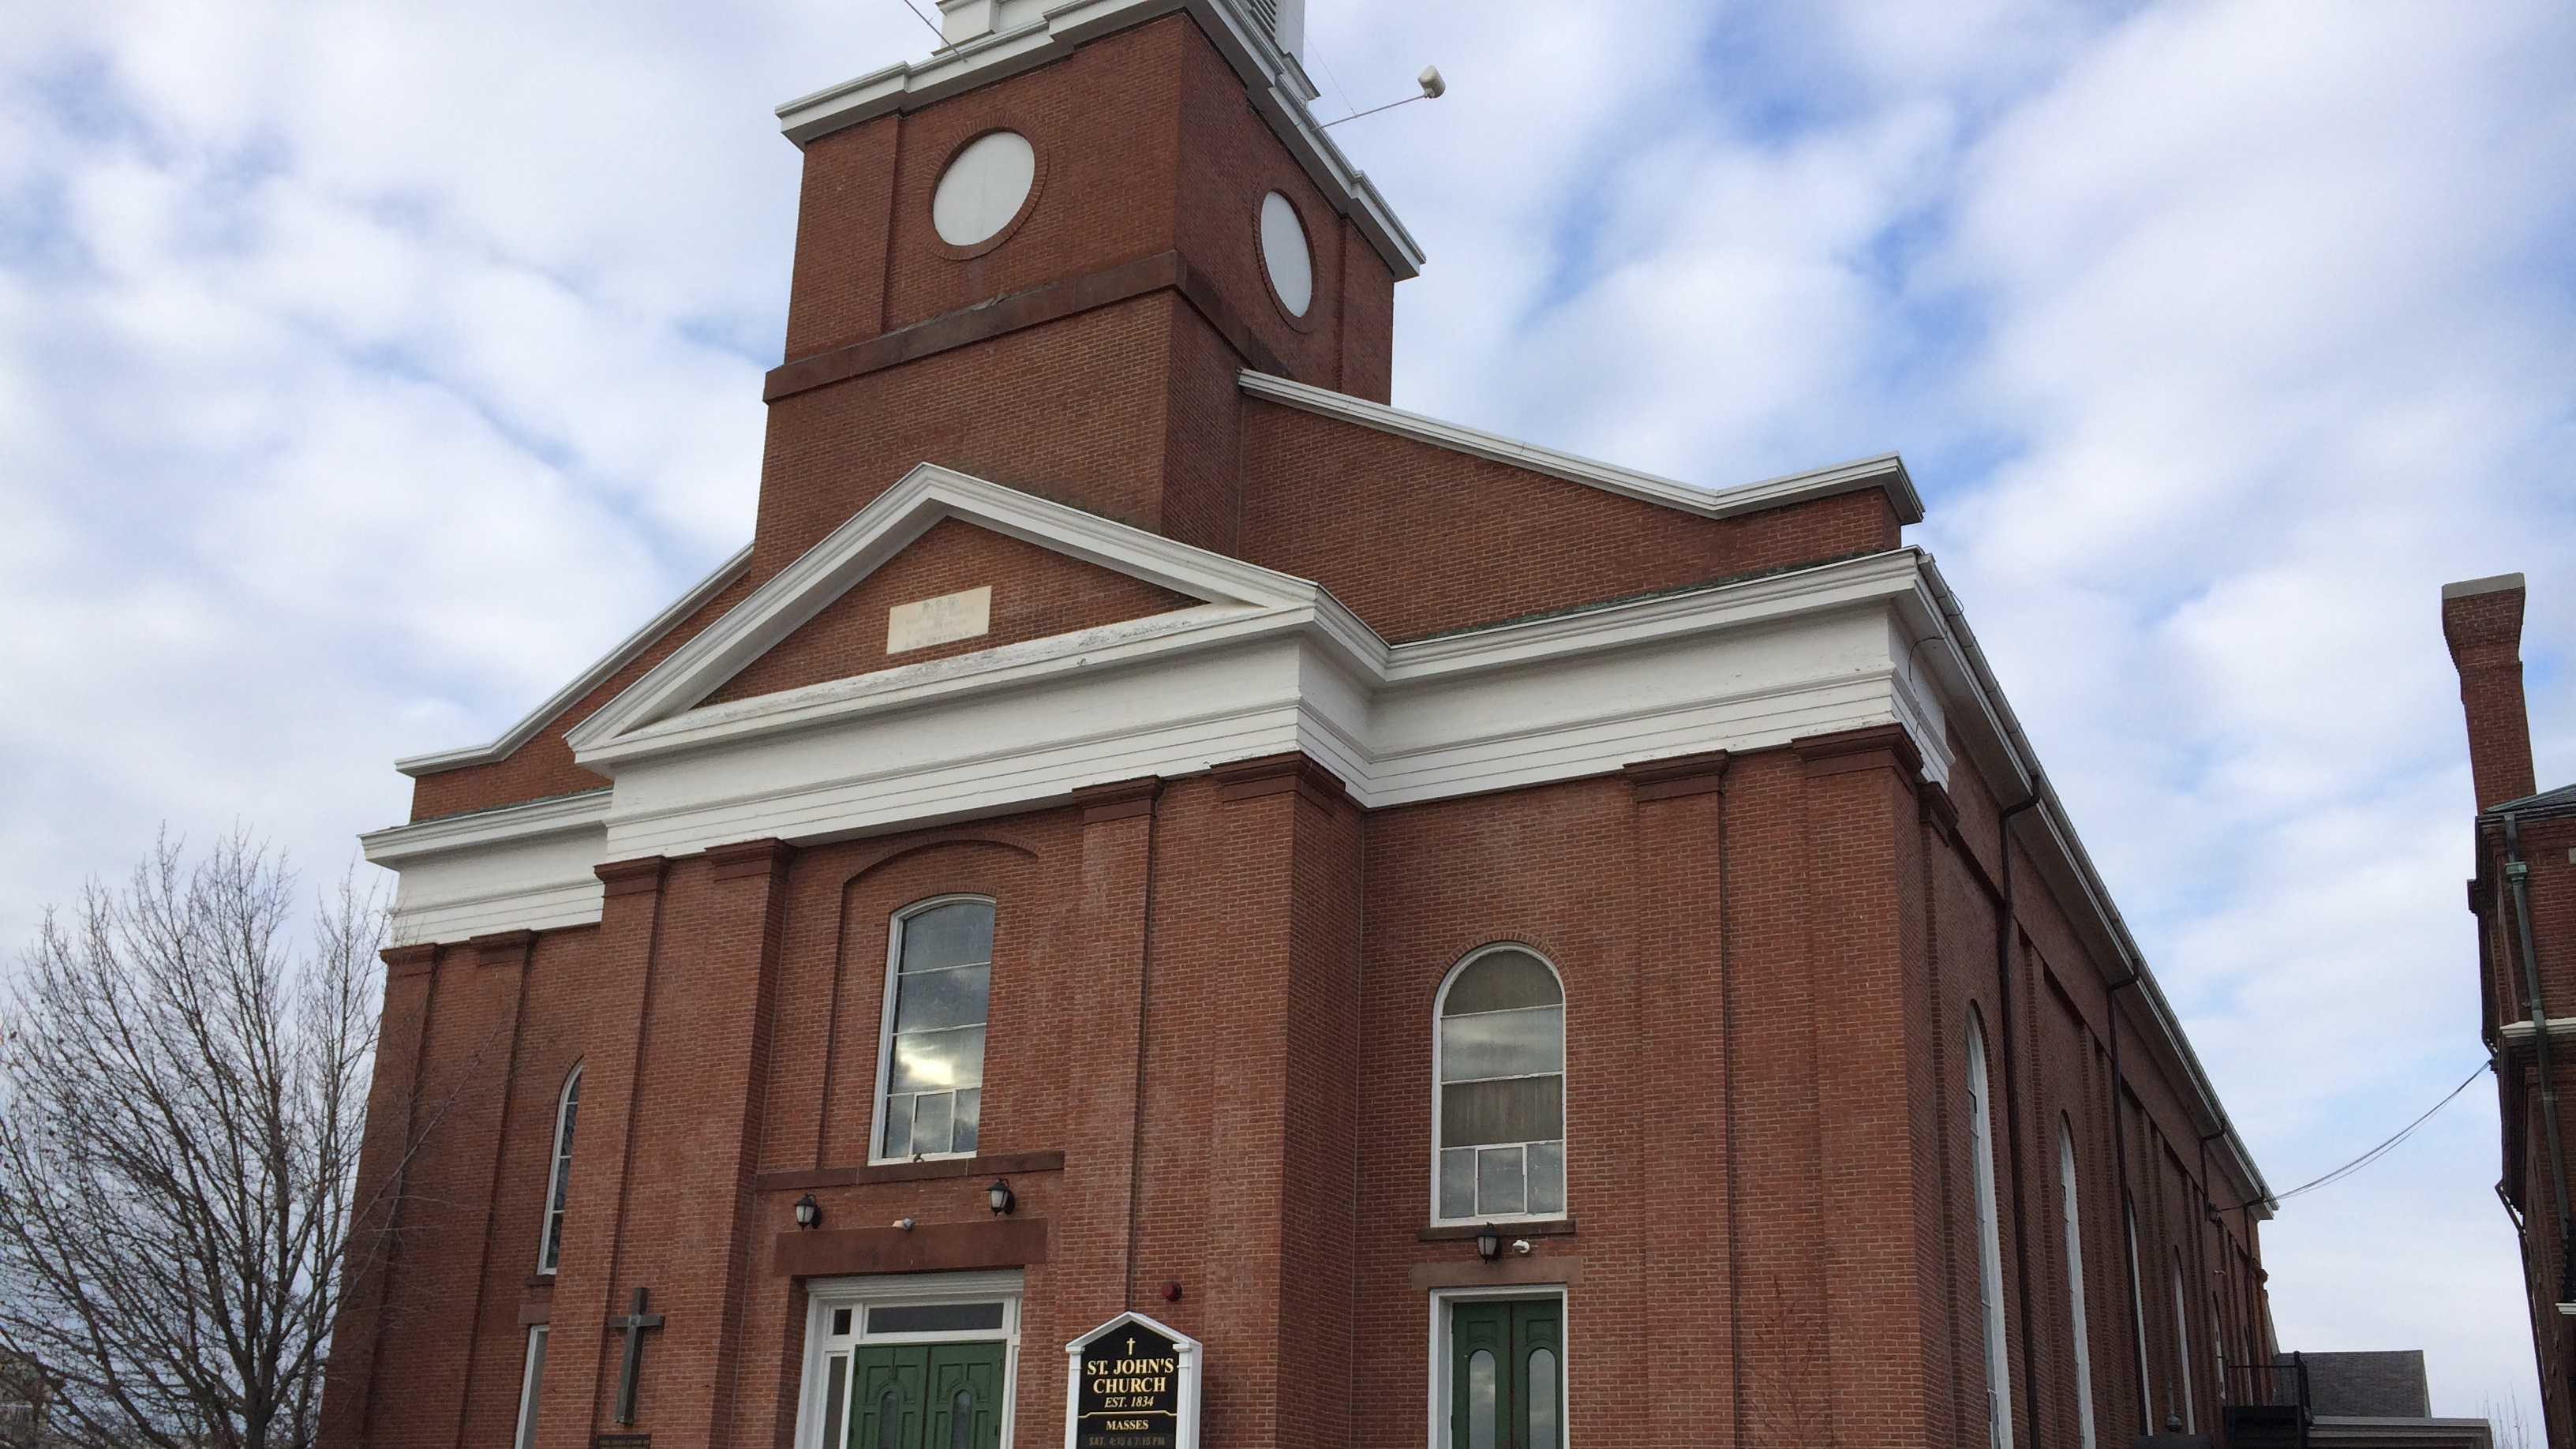 St. Johns Church Worcester 122413